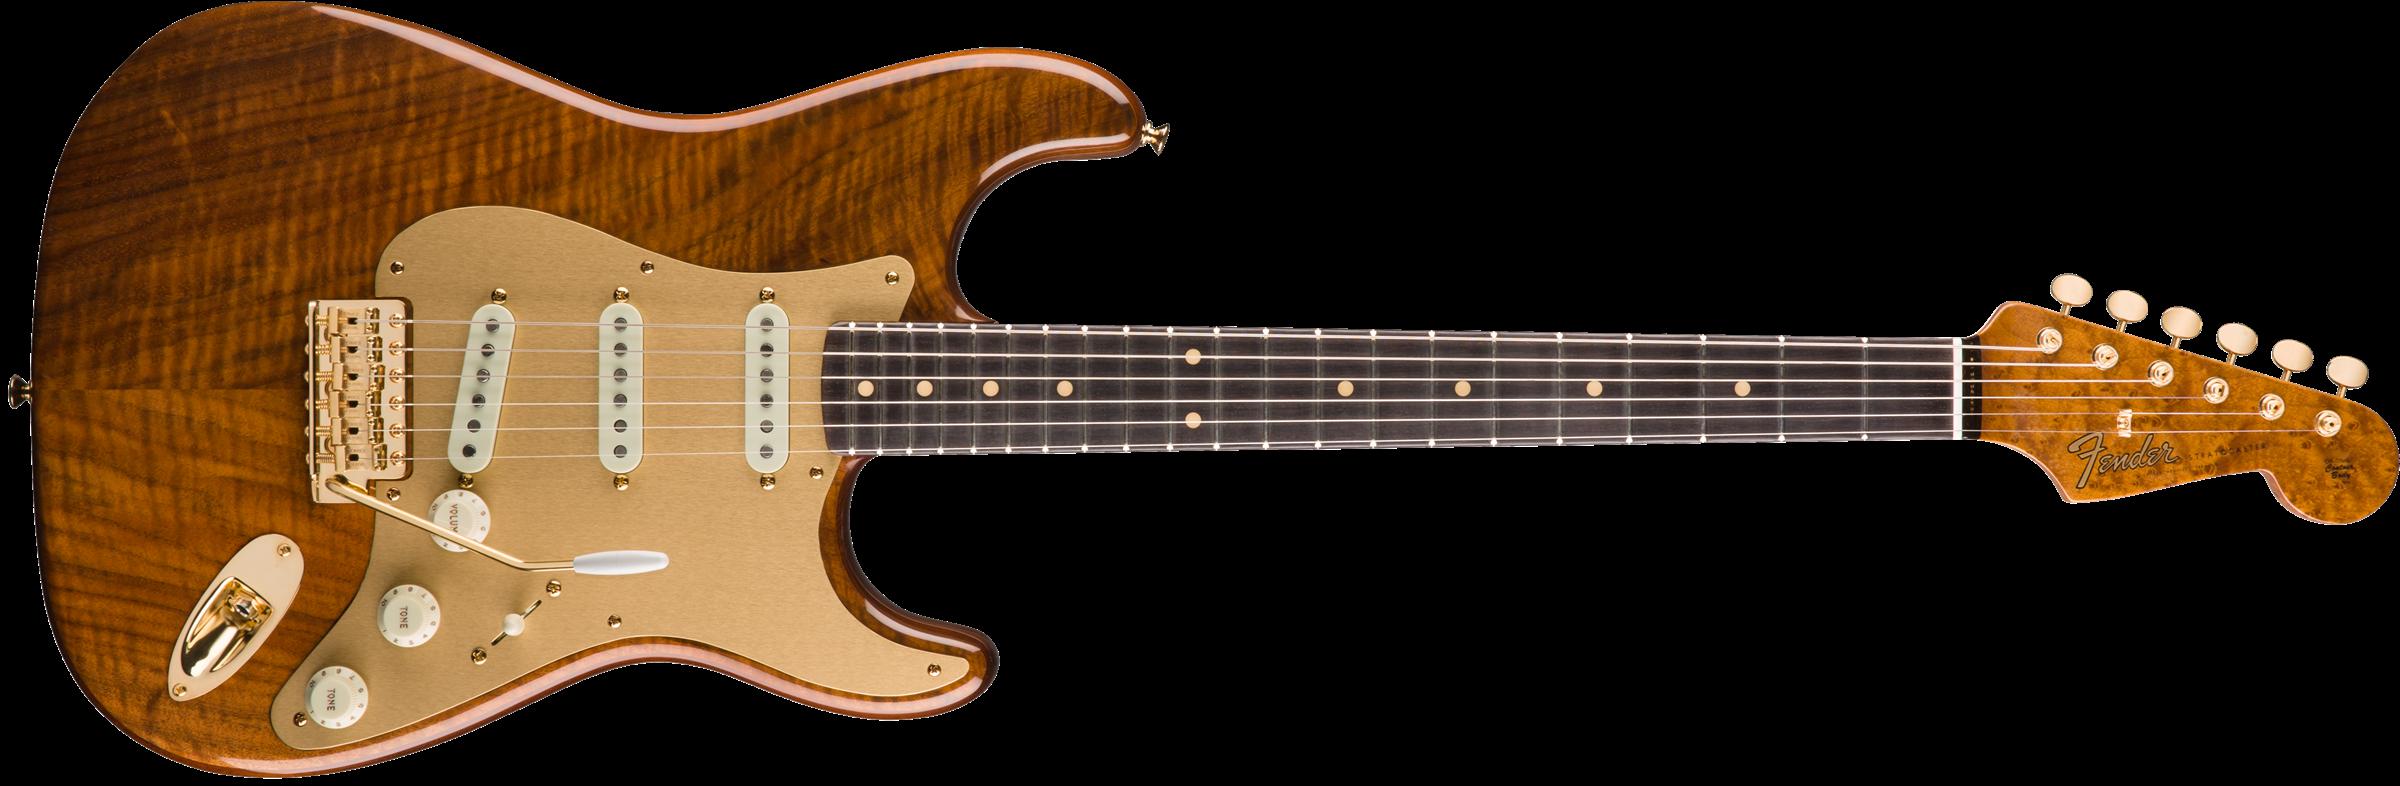 Fender Custom Shop Strat